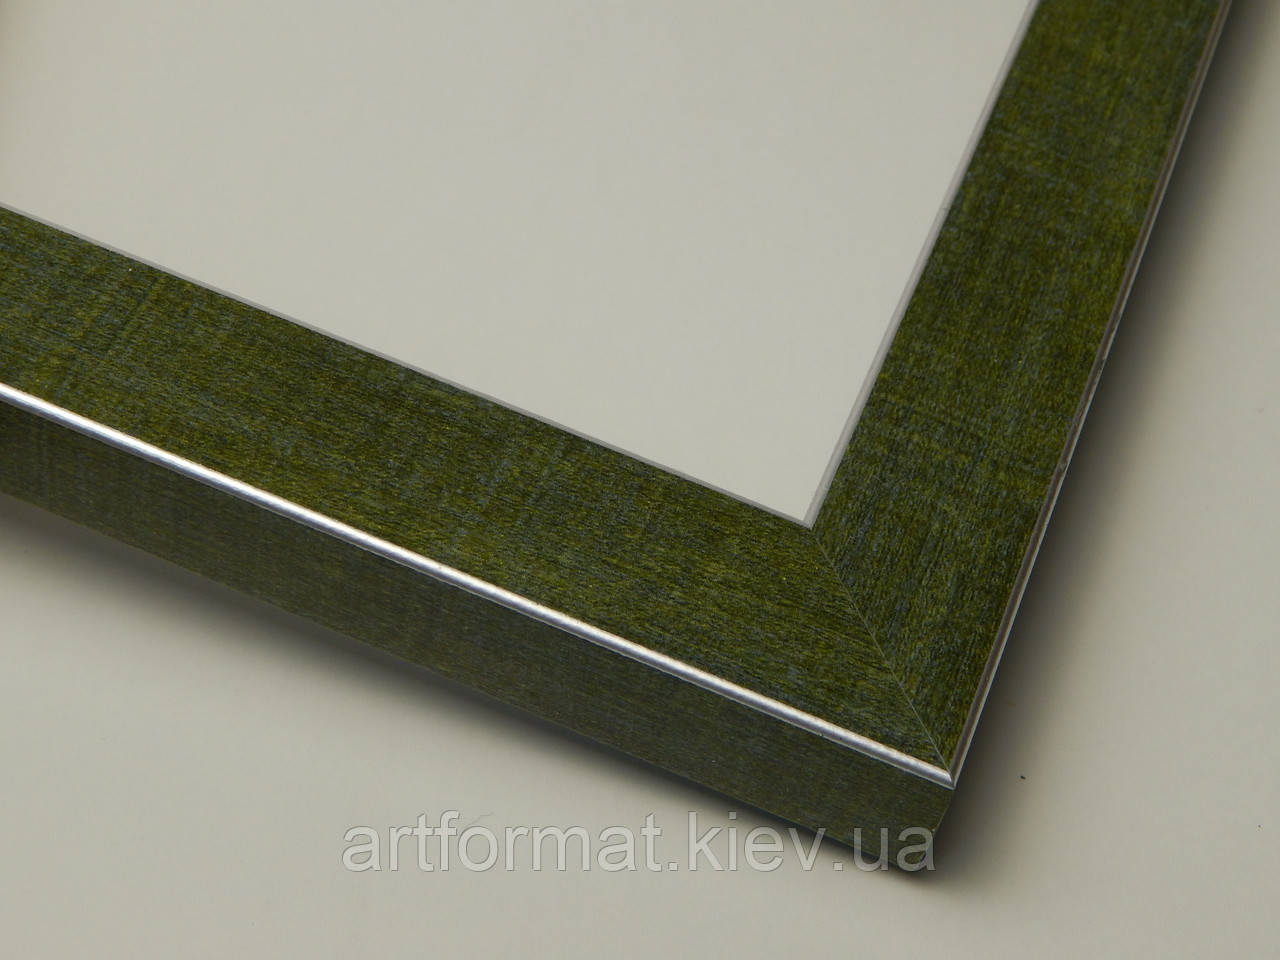 Рамка А2(420х594).Для картин,плакатов,фото...22 мм.Зеленый